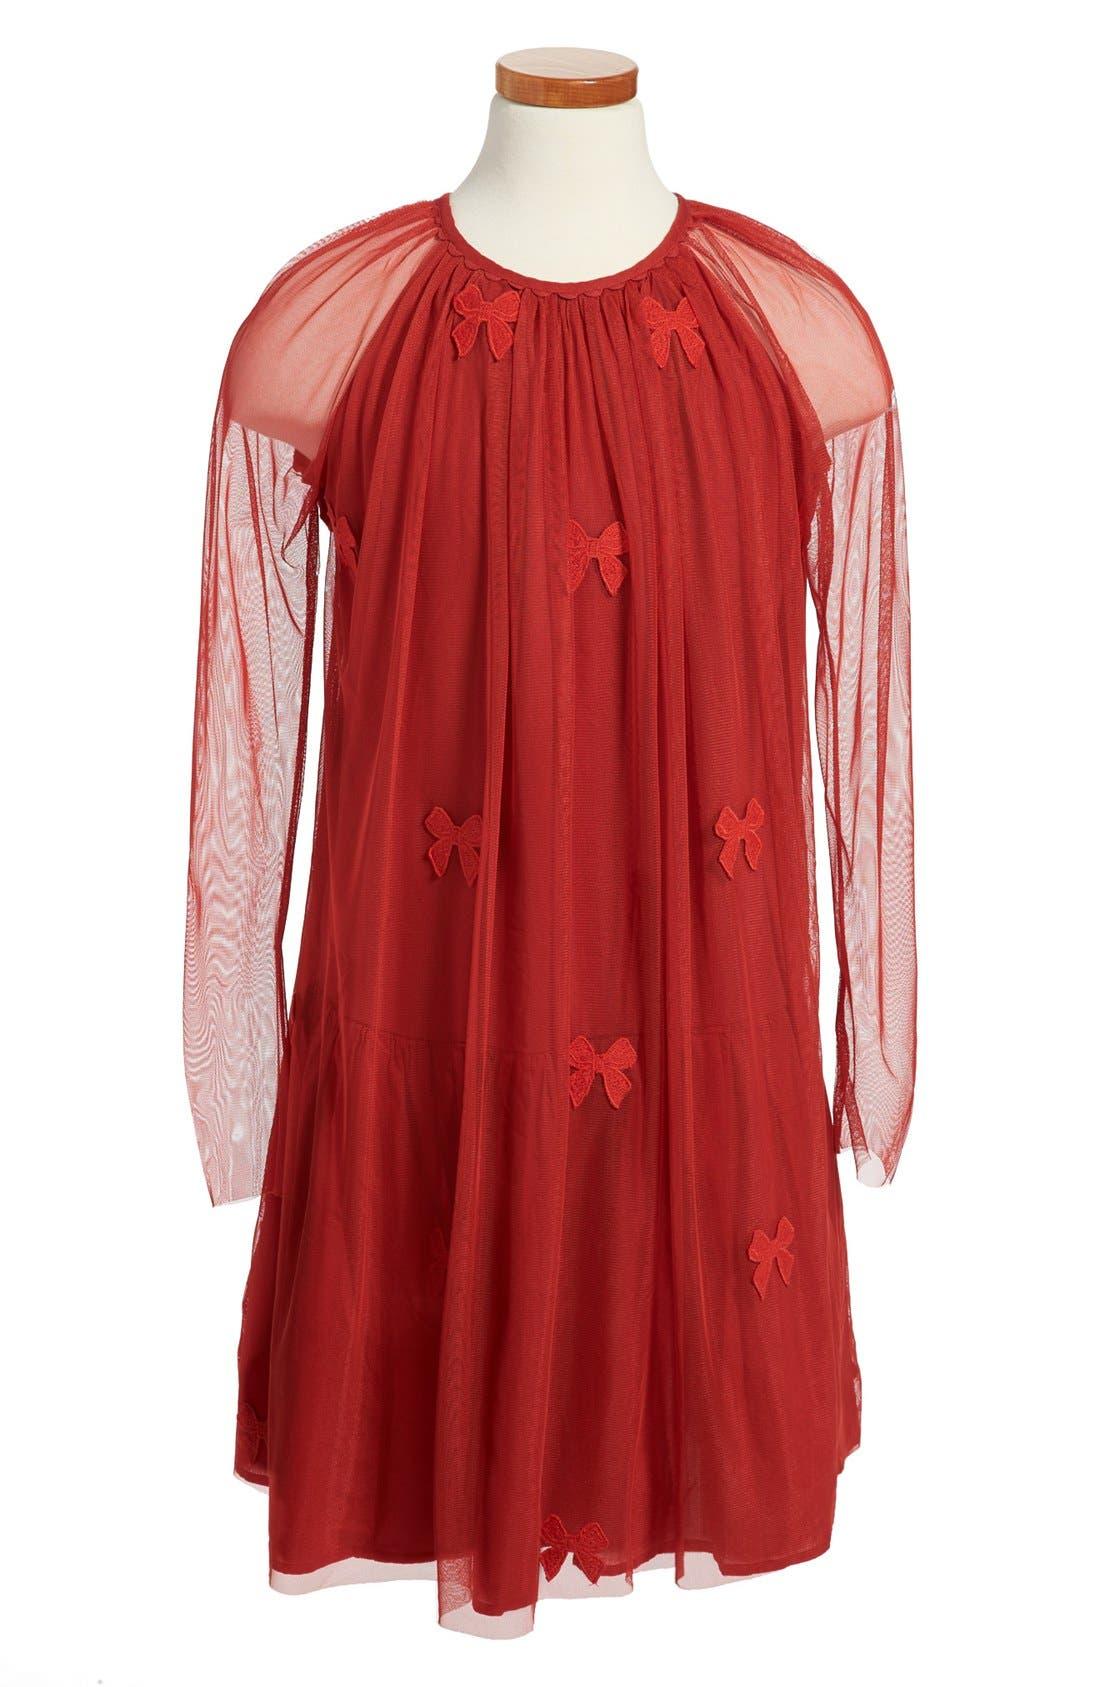 Main Image - Stella McCartney Kids 'Misty' Dress (Toddler Girls, Little Girls & Big Girls)